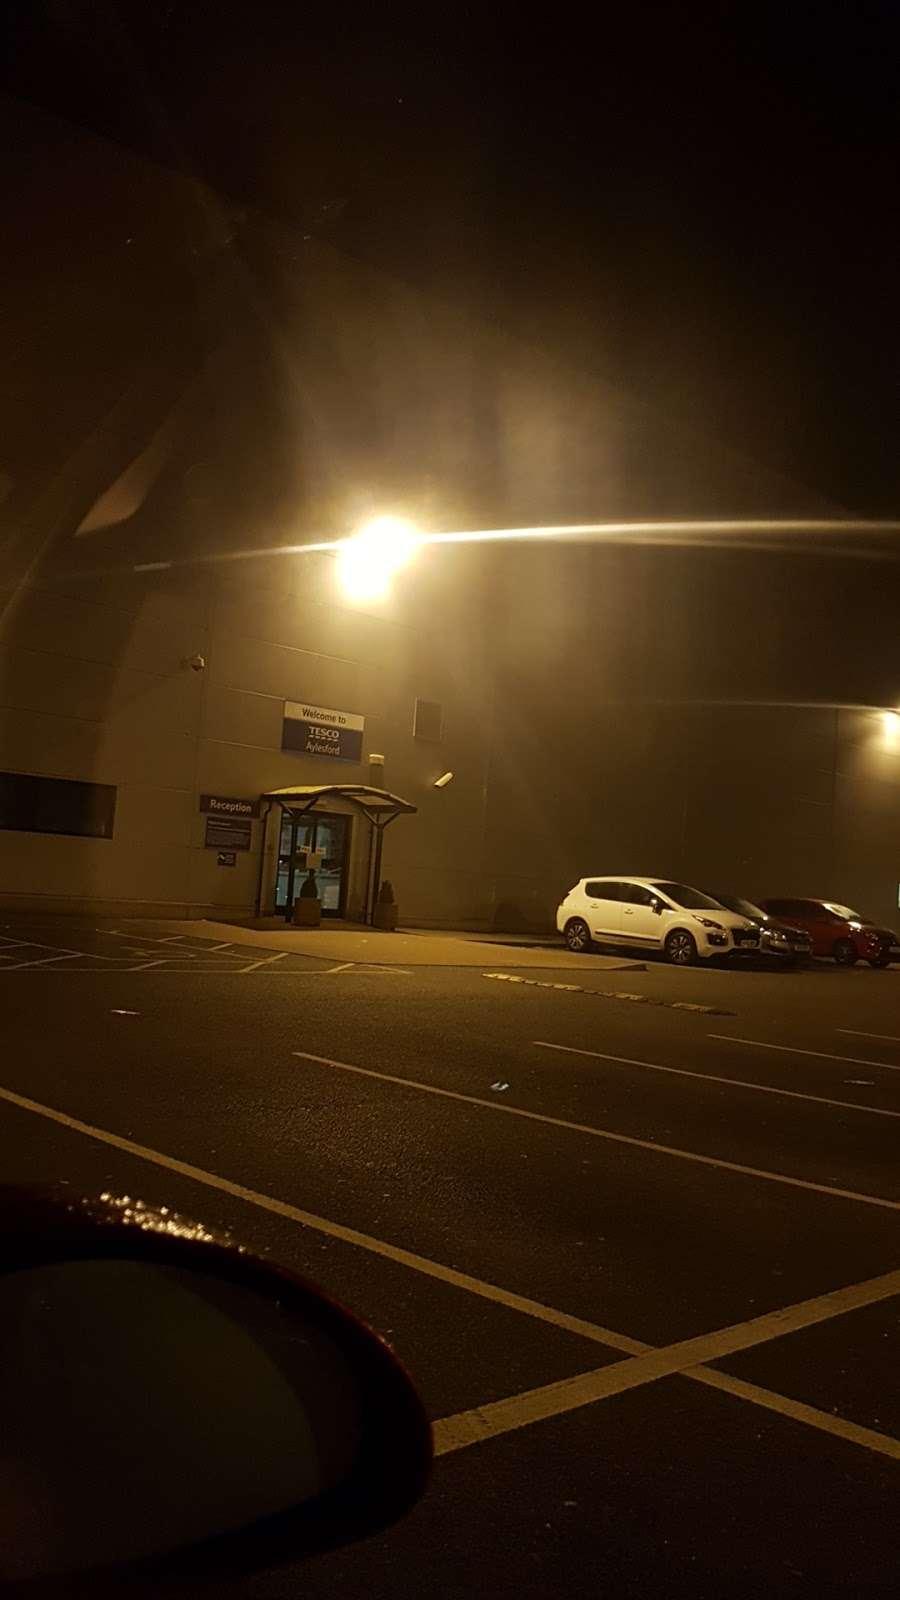 Tesco Dotcom CFC Aylesford - storage  | Photo 5 of 5 | Address: 28 Priory Park, Ditton, Aylesford ME20 7PP, UK | Phone: 01622 700400